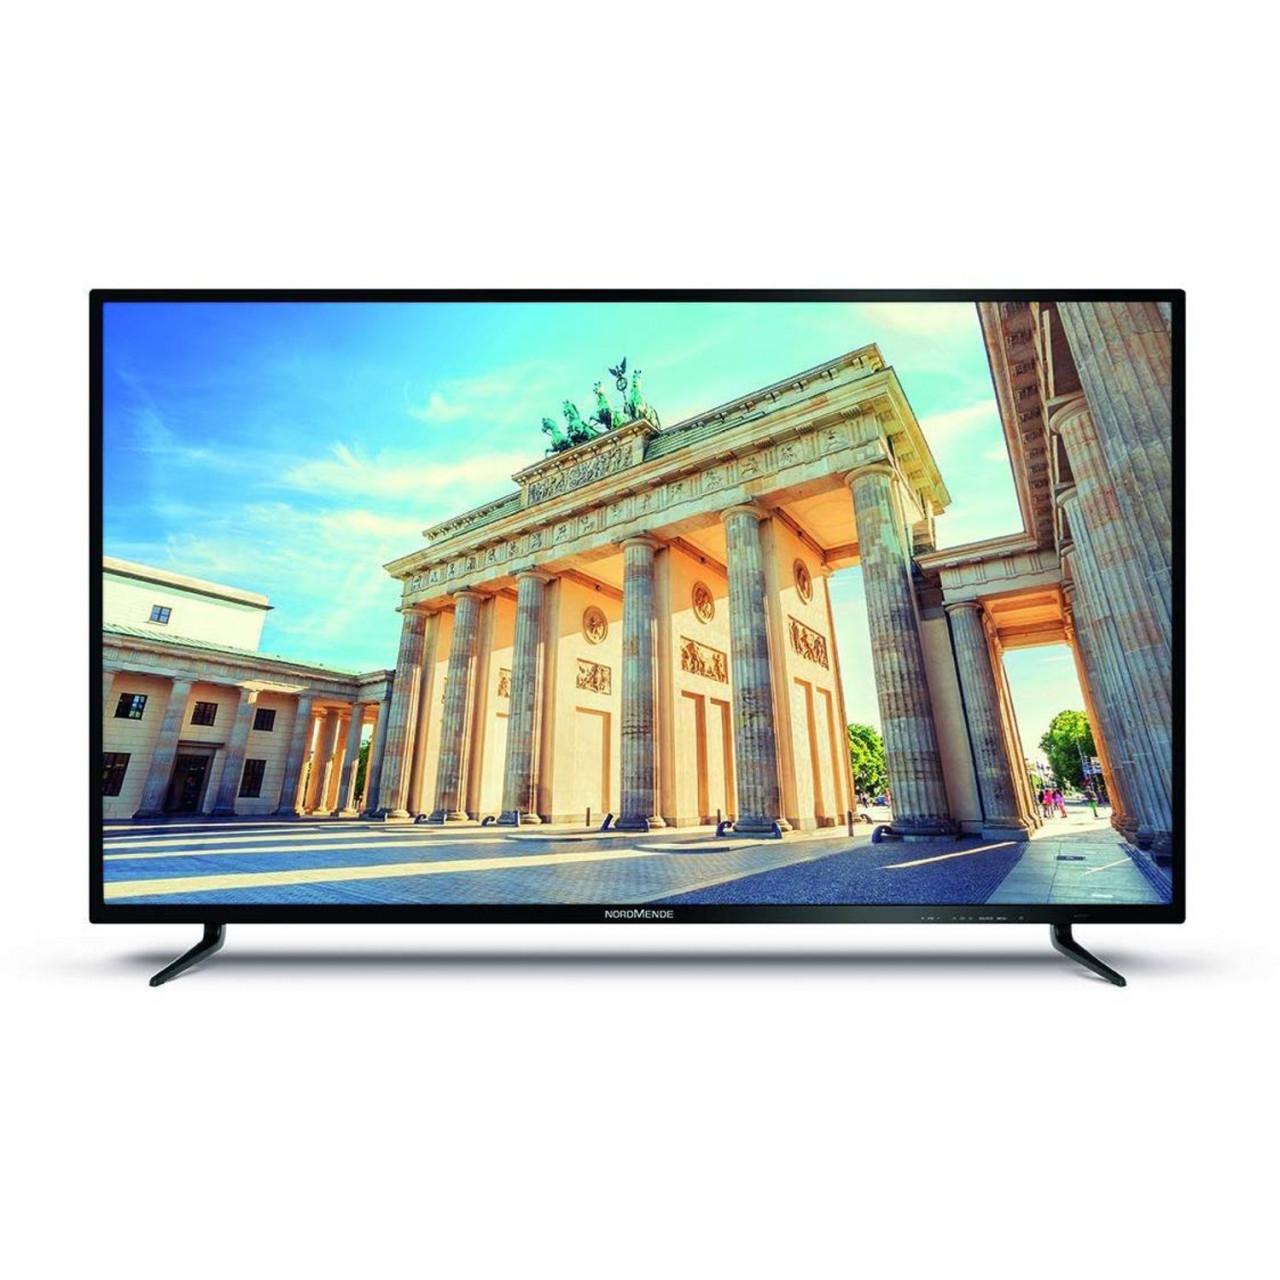 Wegavision UHD55A 139 cm (55 Zoll) 4K UHD Fernseher (Integrierter Triple-Tuner)